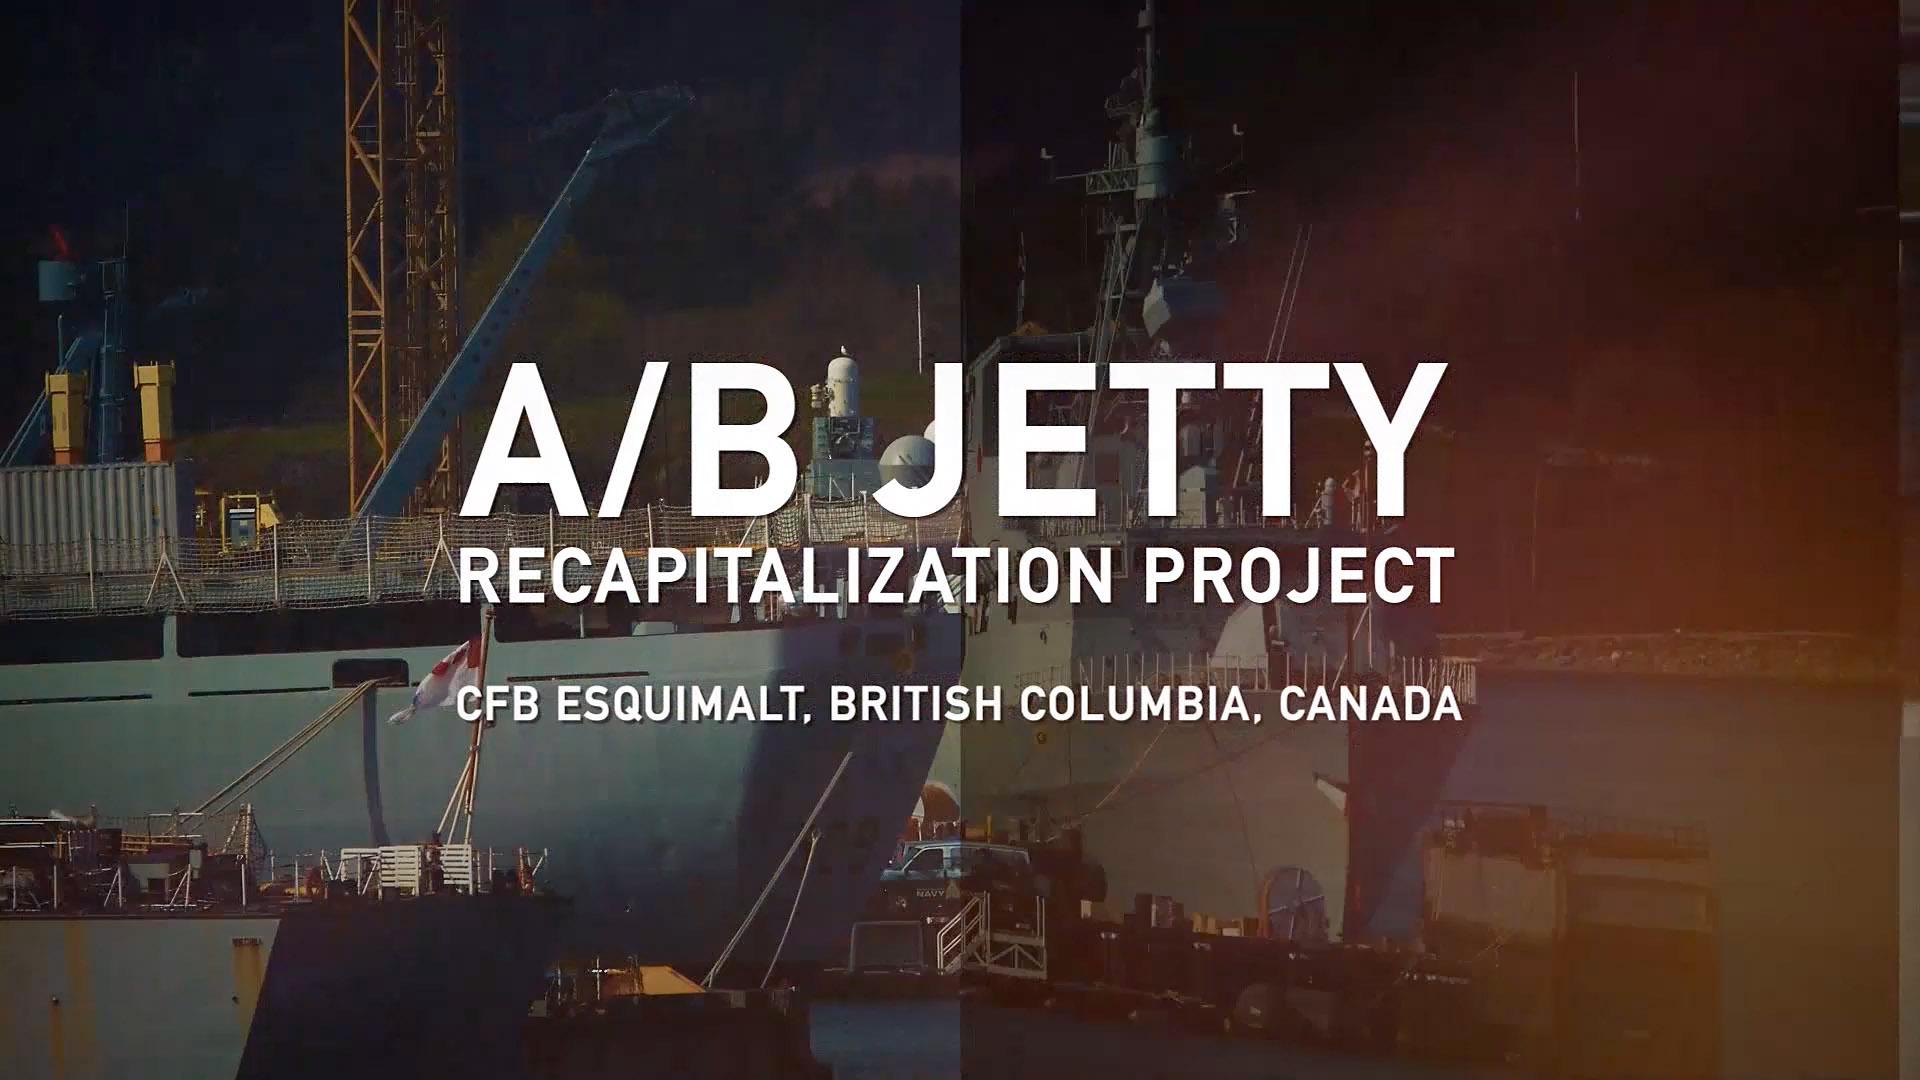 A/B Jetty Recapitalization Project and Esquimalt Harbour